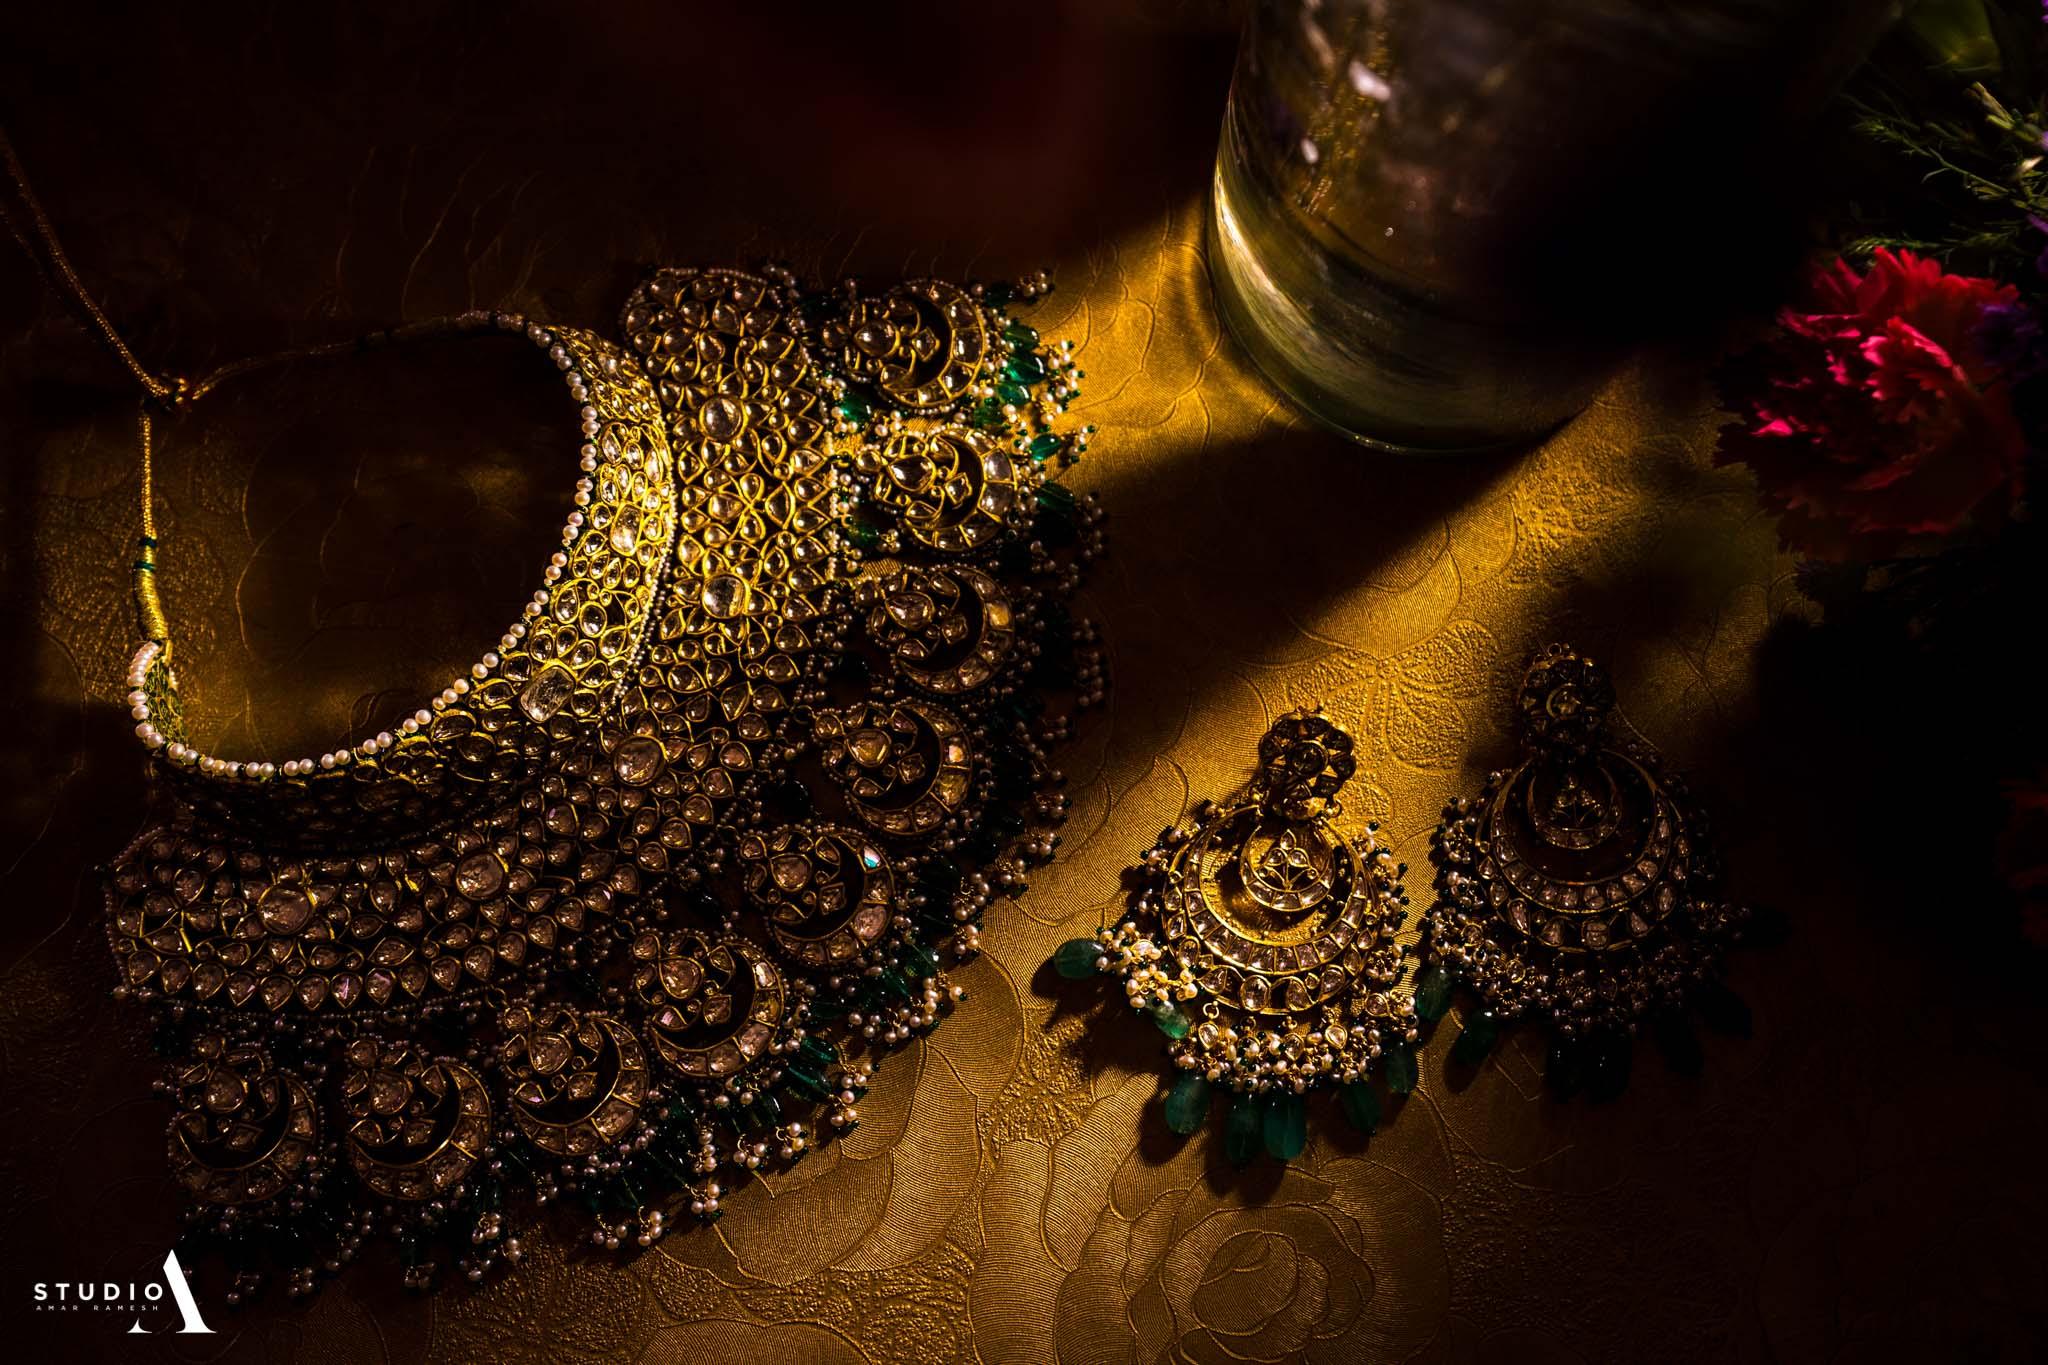 studioa-wedding-photography-chennai-14